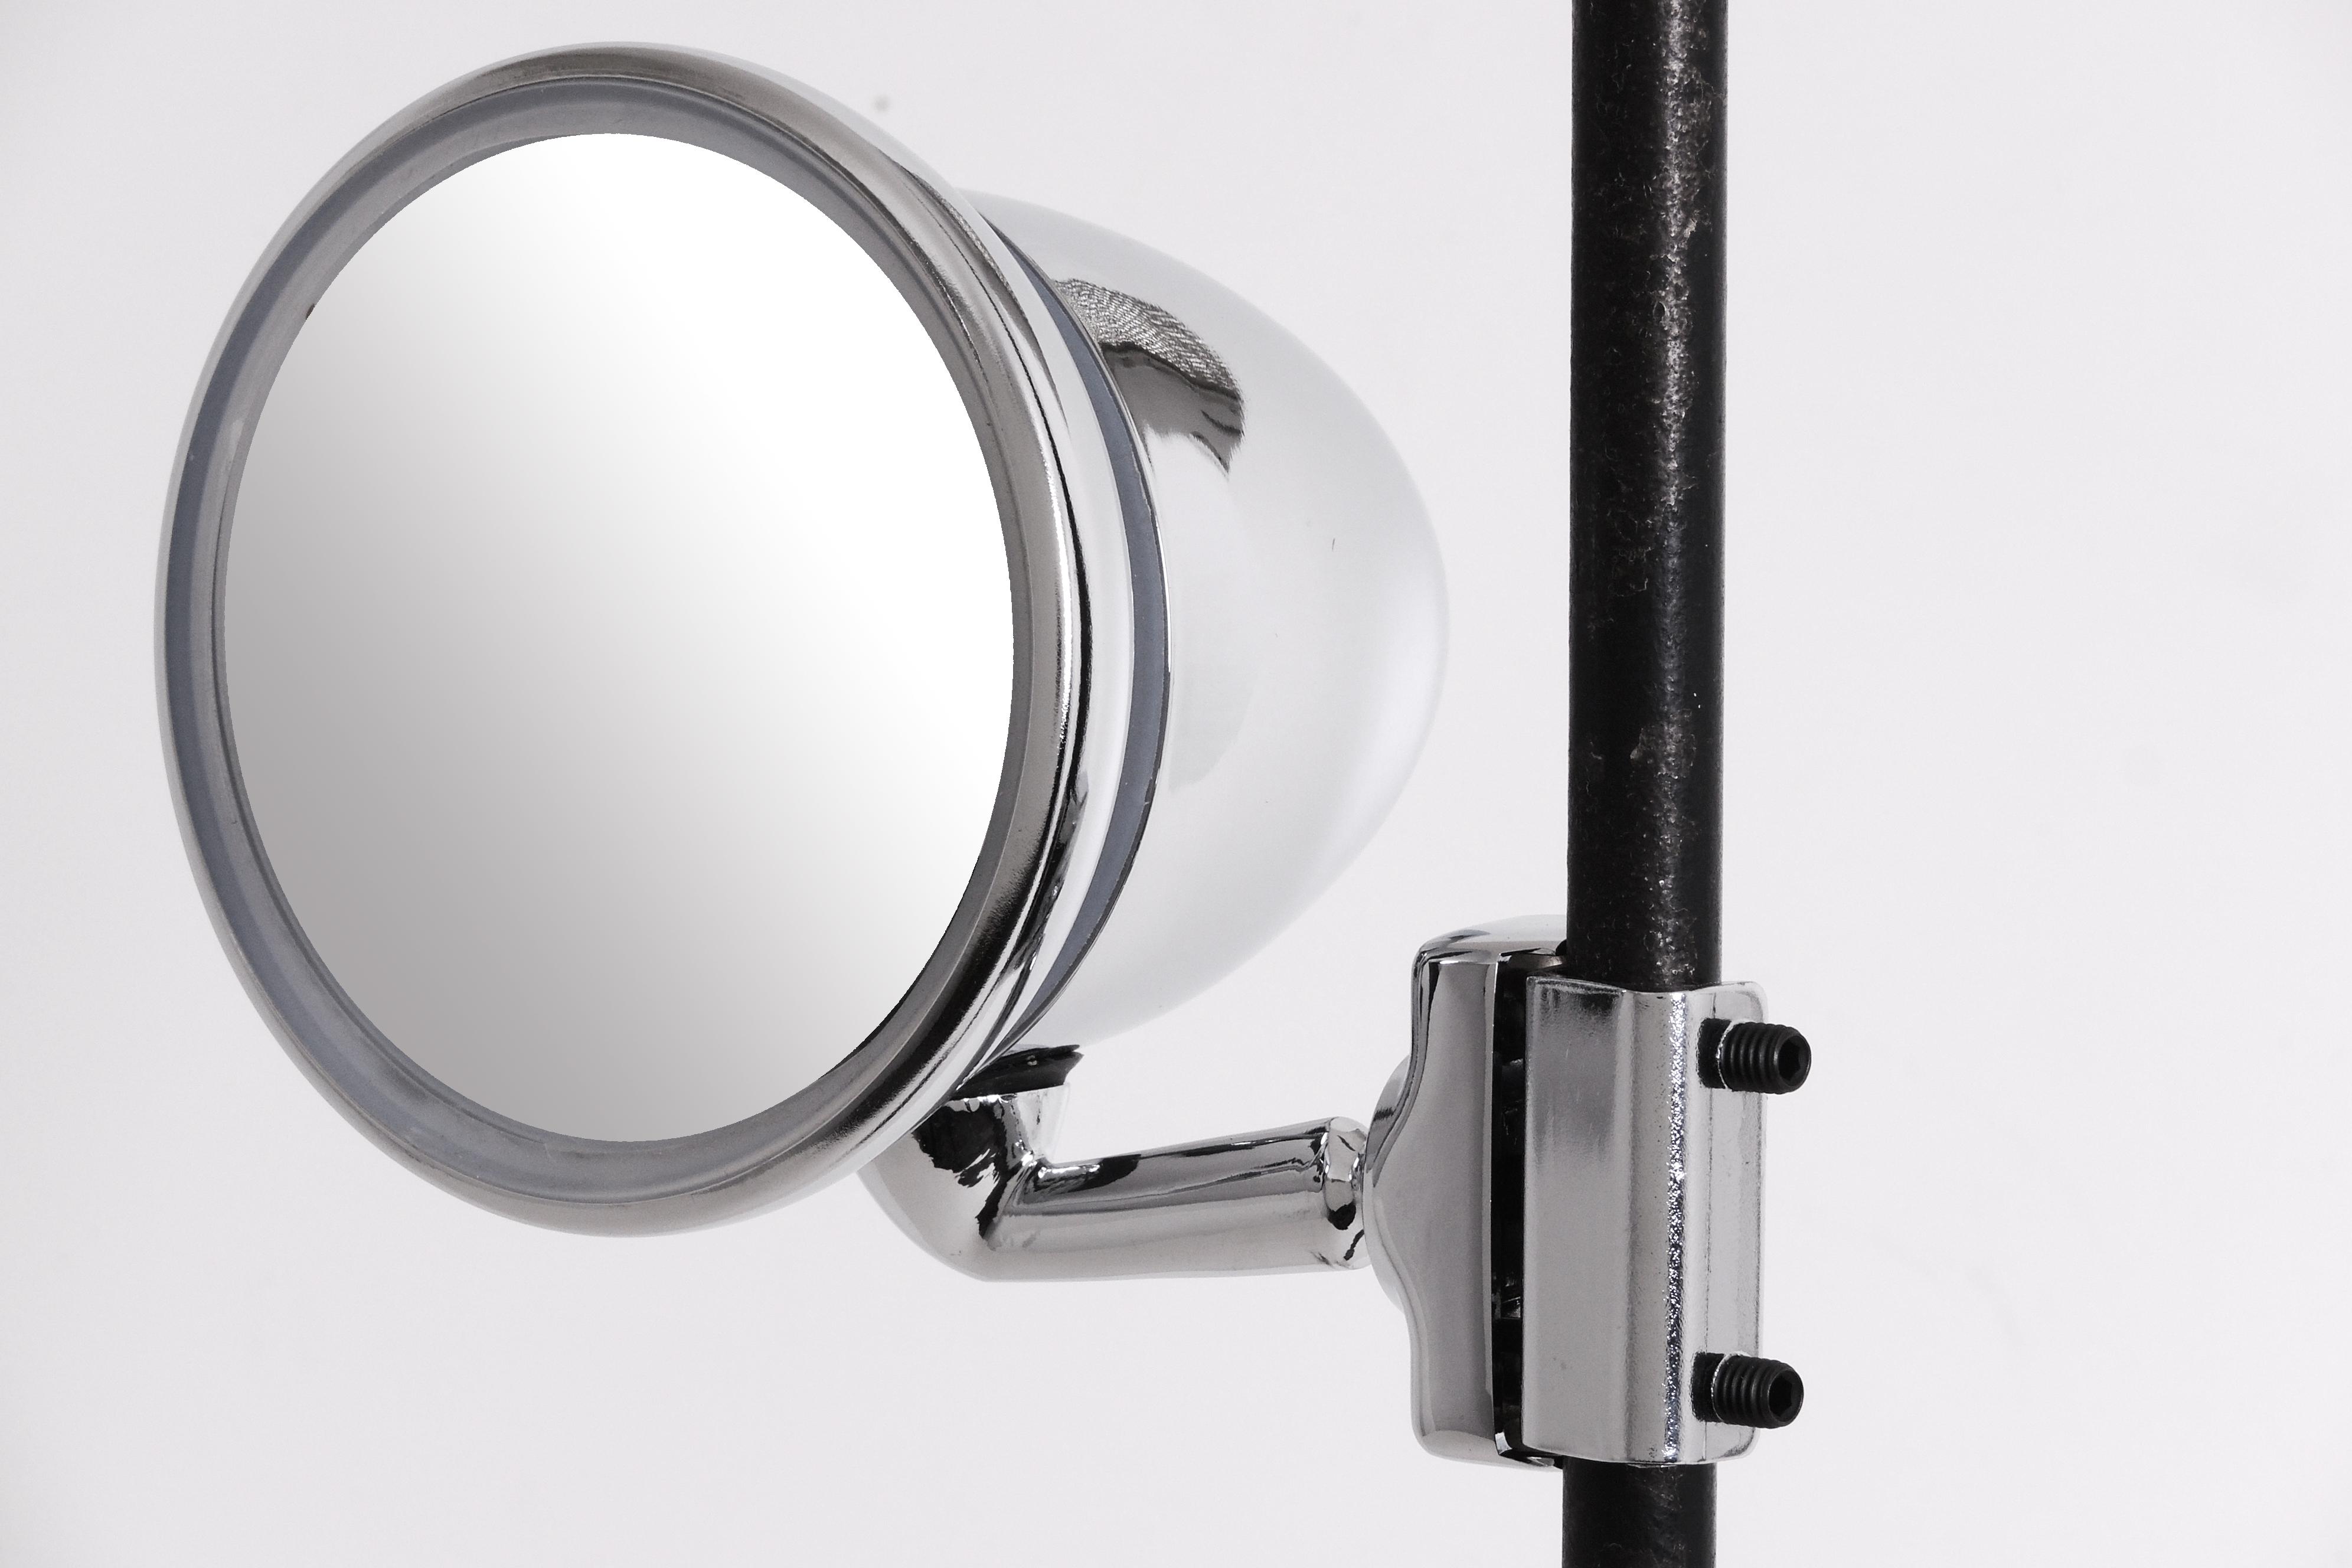 1x spiegel klemmspiegel chrom vw mercedes opel renault bmw for Spiegel youngtimer